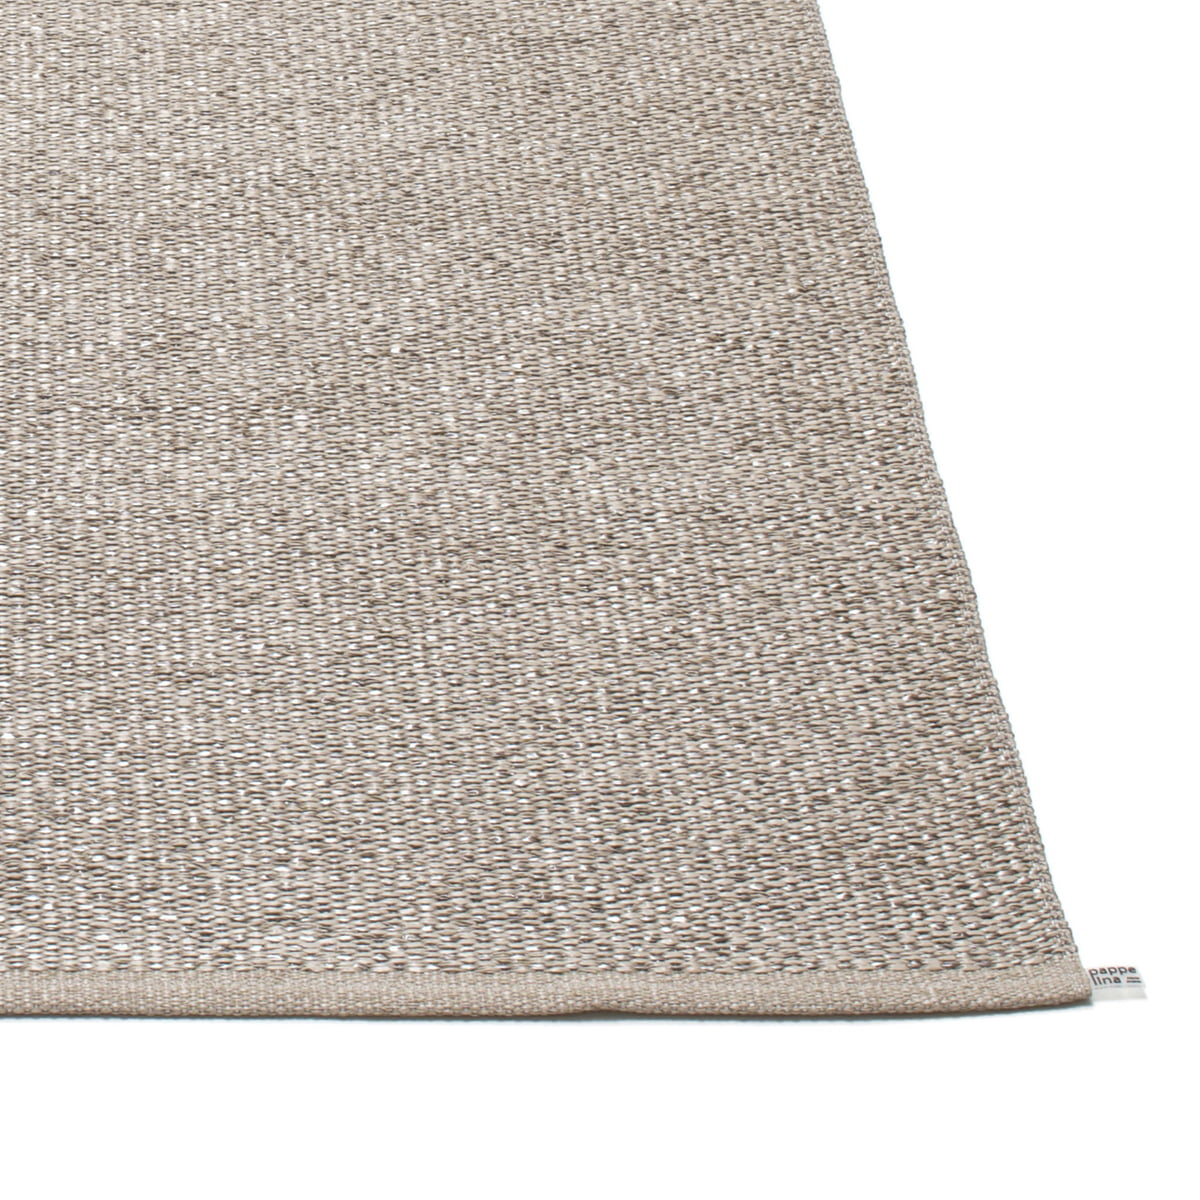 Pappelina Teppich svea outdoor teppich pappelina bei connox ch